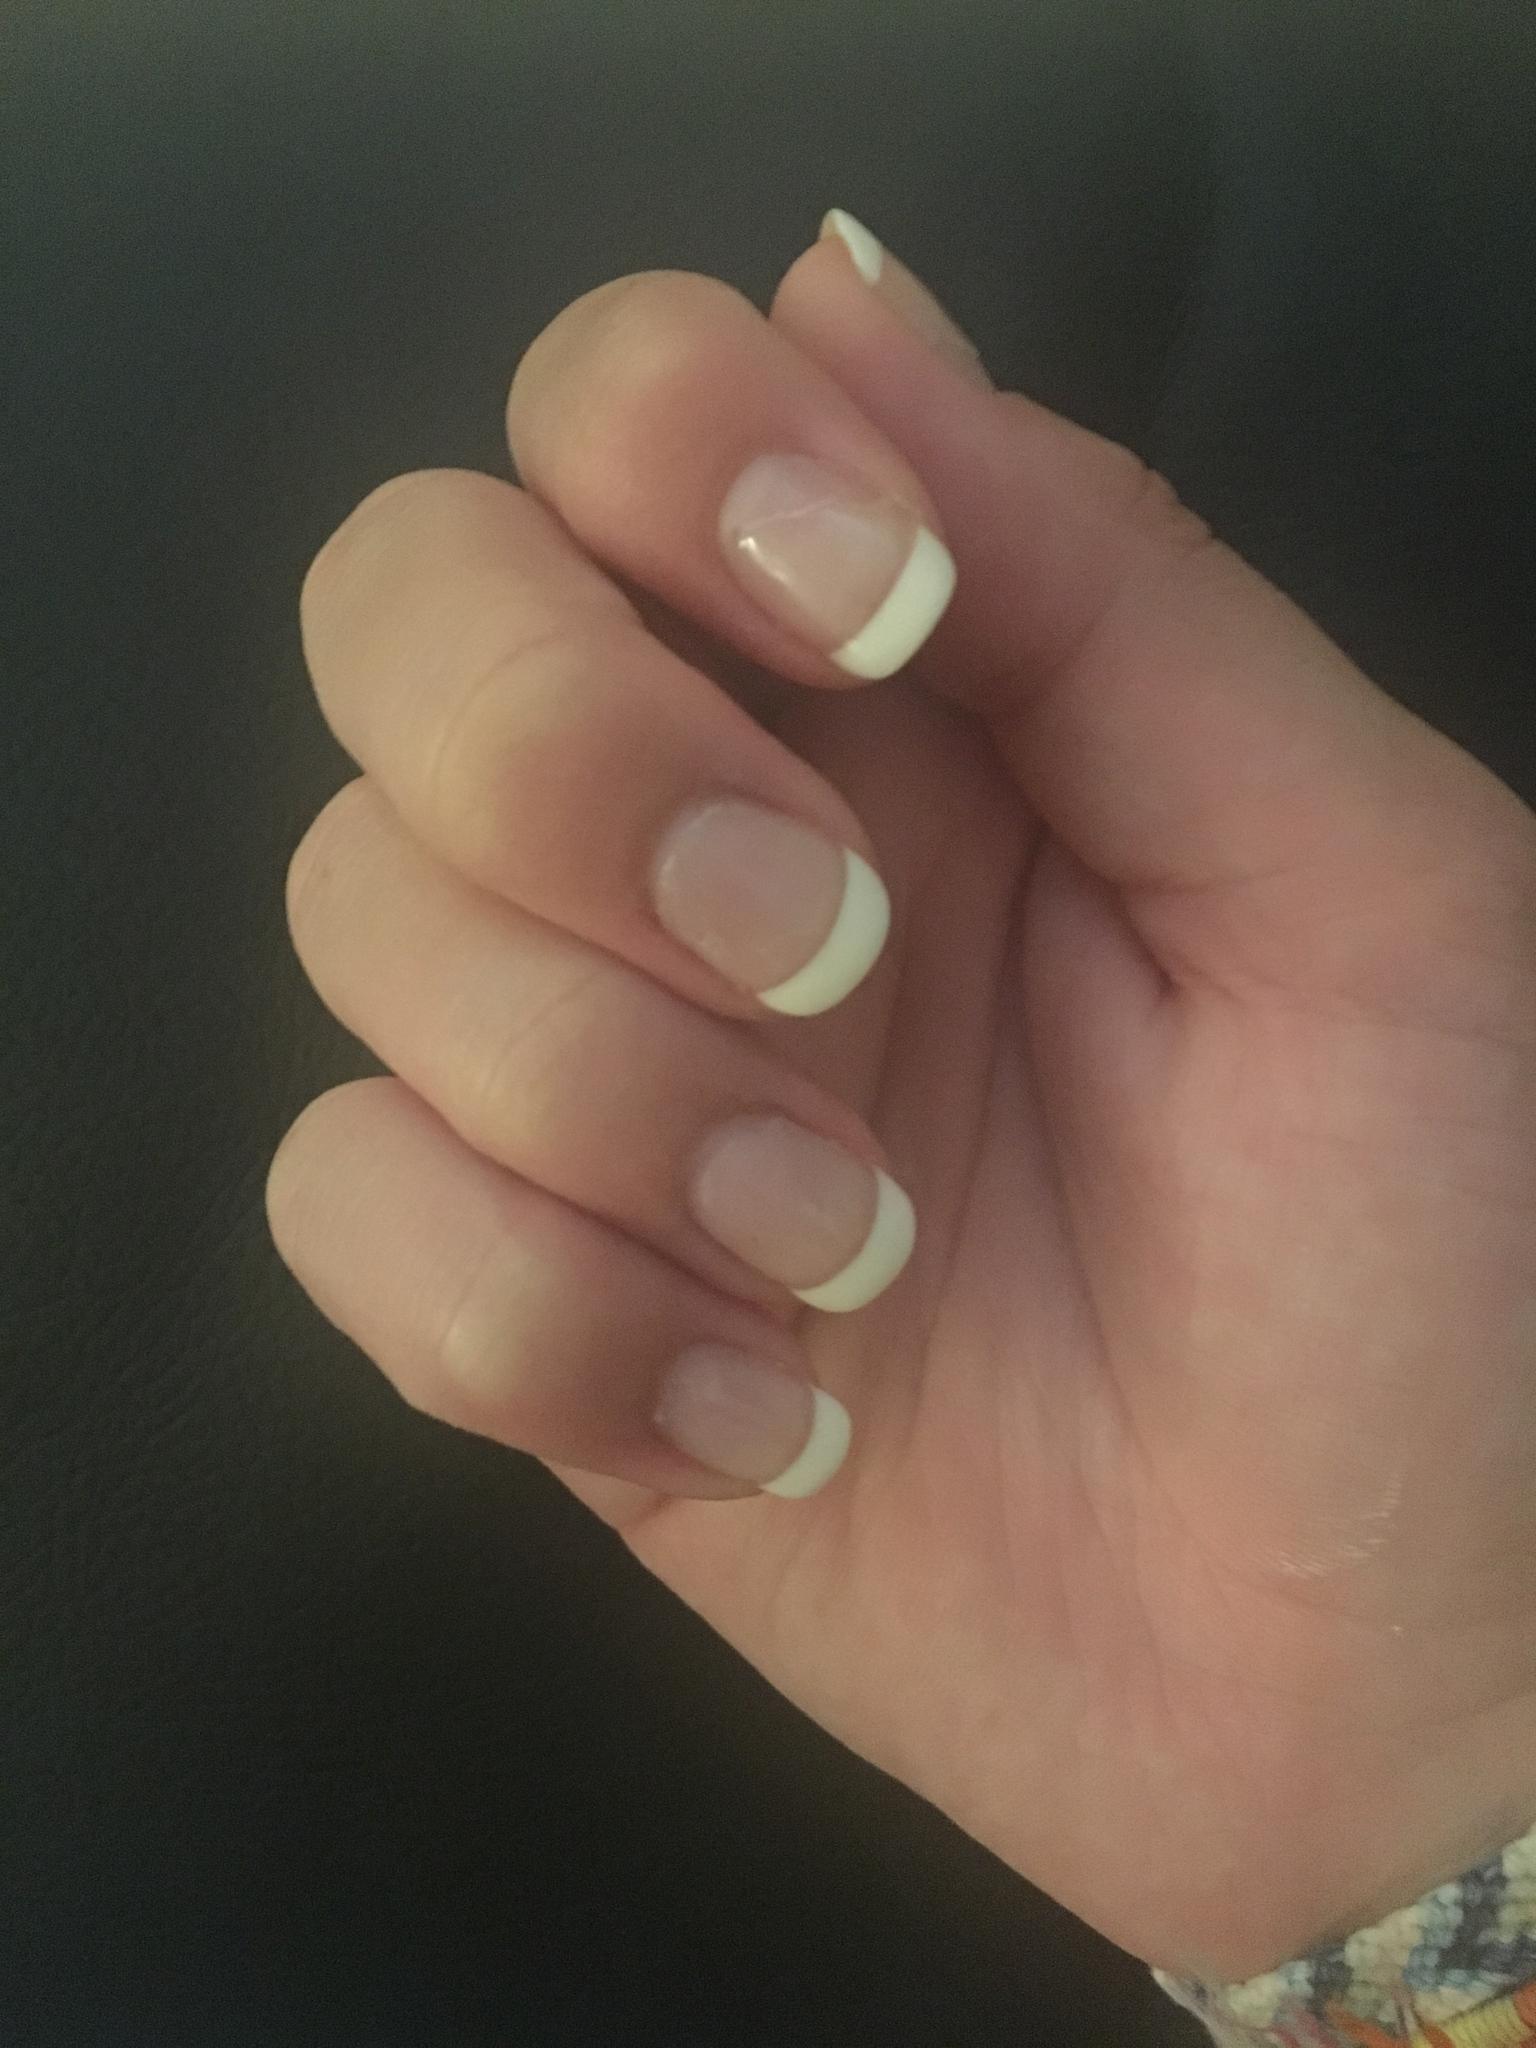 Nice One Nails - 3B-3098 Carling Ave, Ottawa, ON